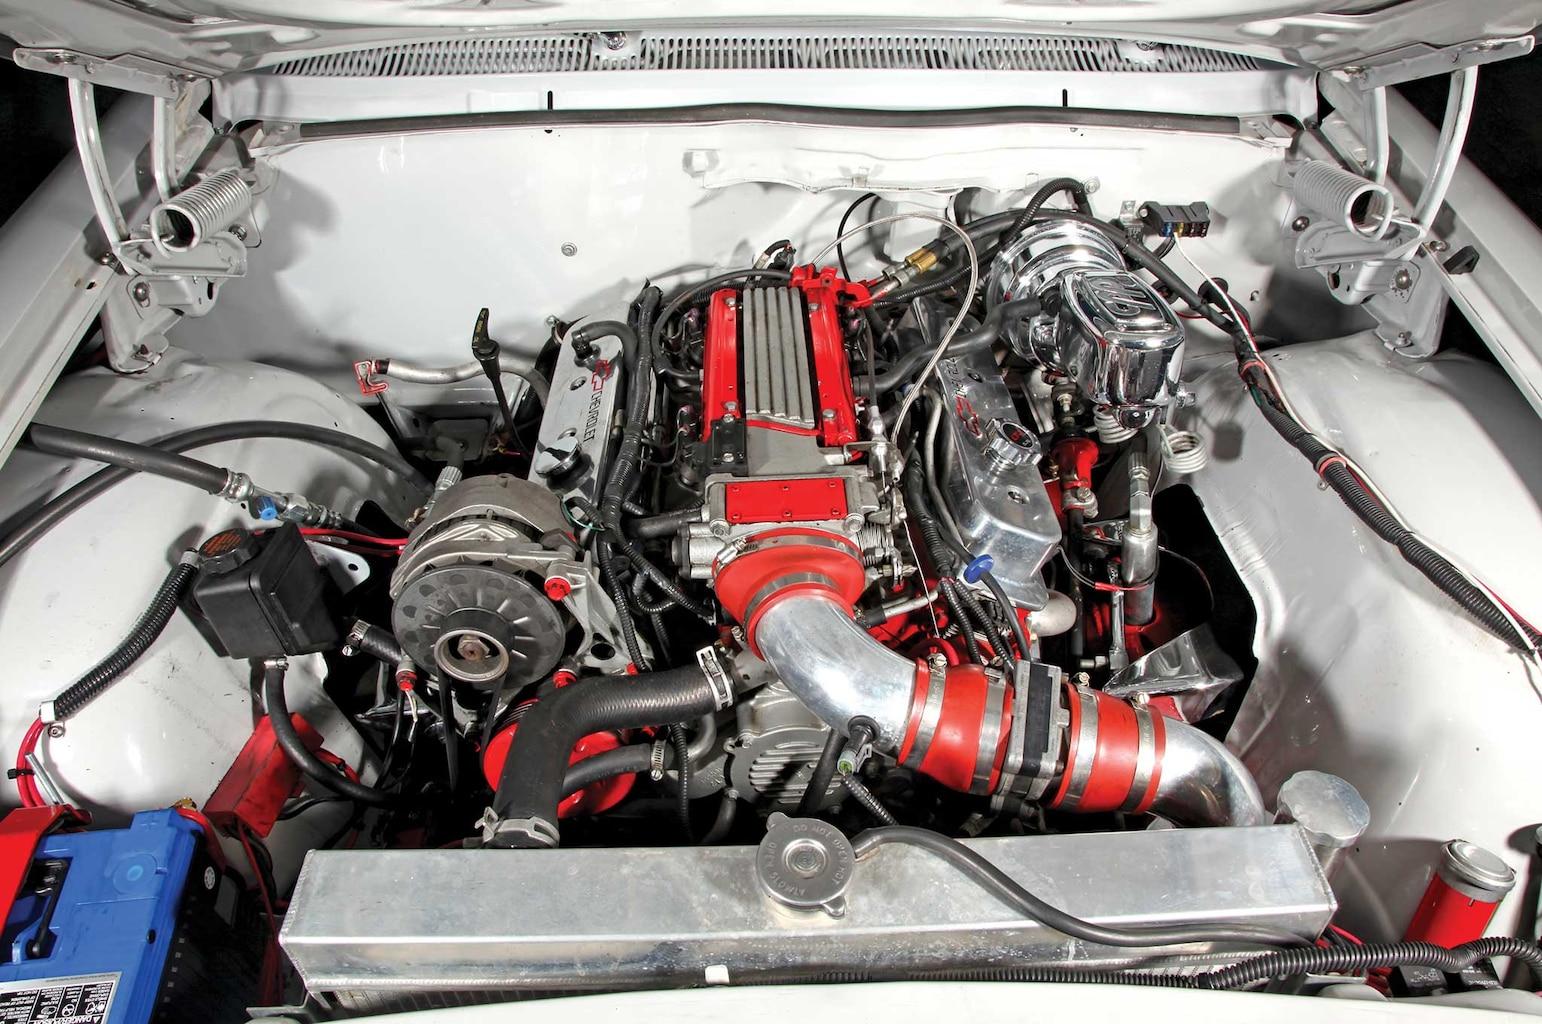 003 1962 chevrolet impala convertible lt1 v8